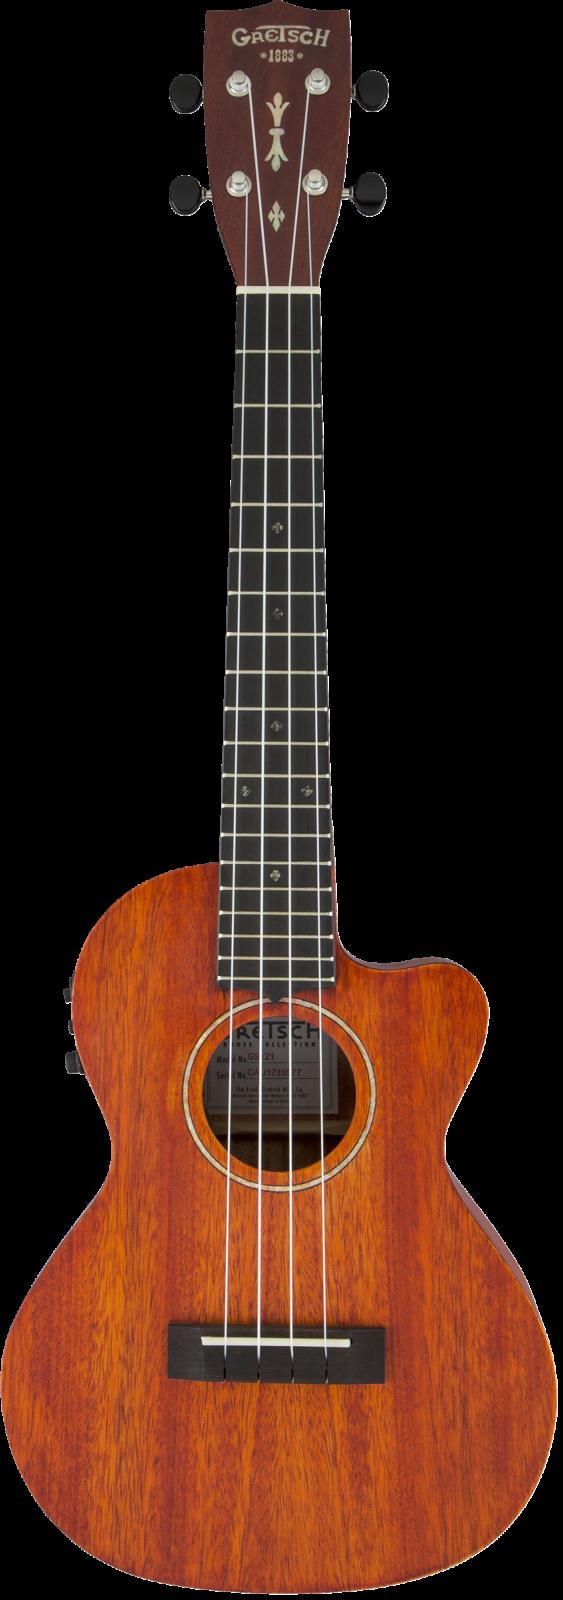 Gretsch G9121 A.C.E. Tenor Acoustic-Electric Ukulele with Gig Bag